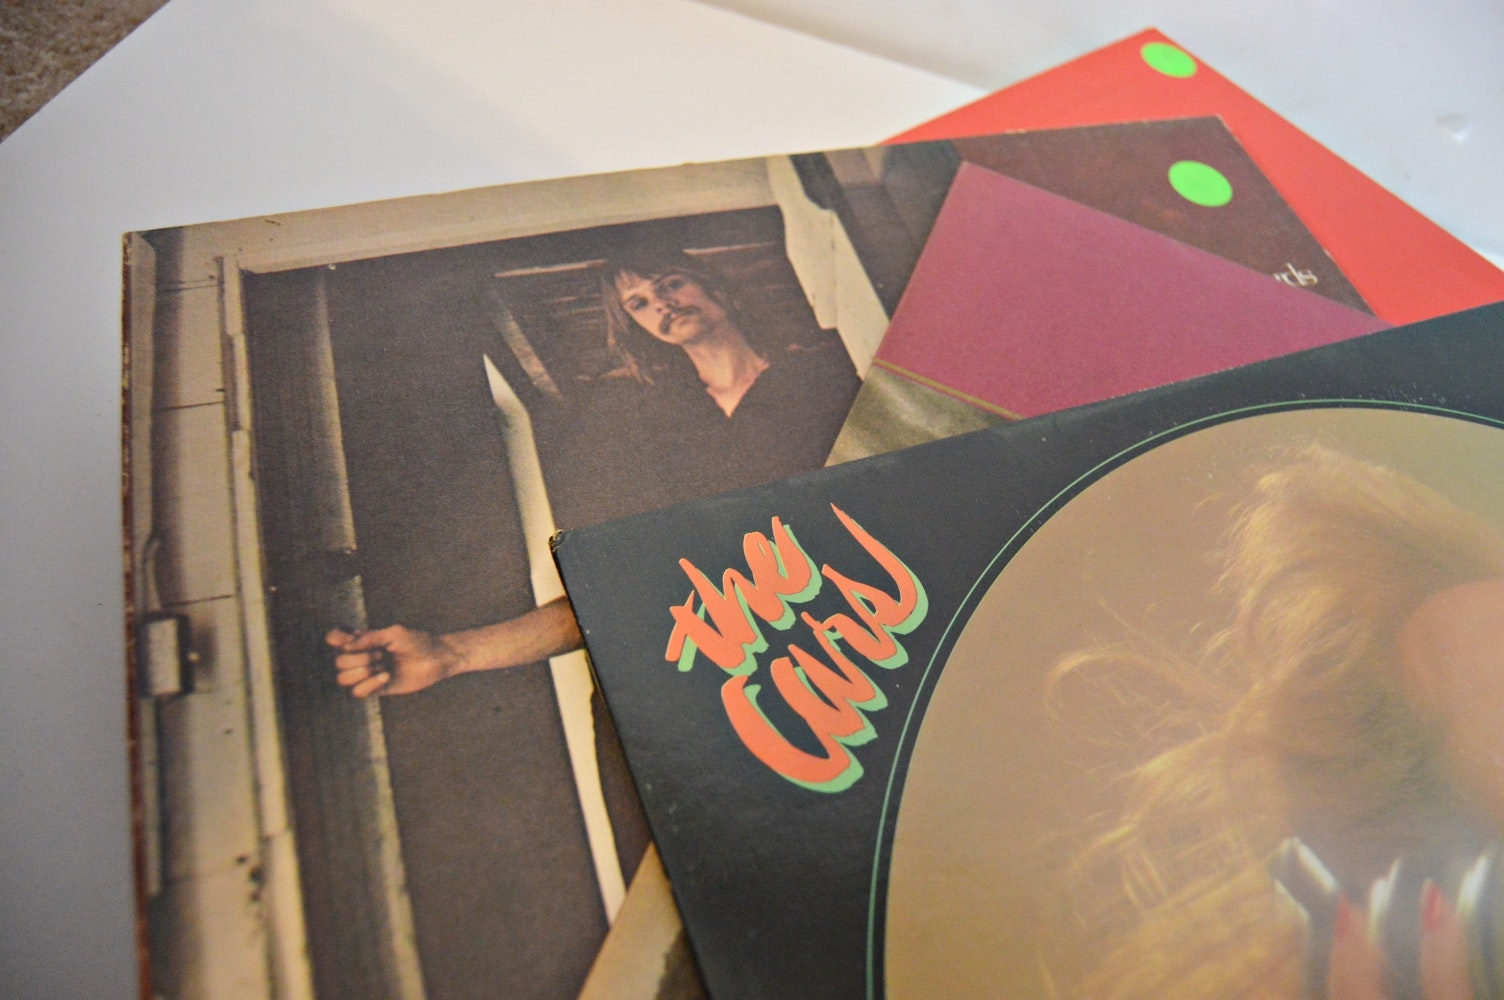 1960s 1970s Vinyl Rock Album Collection With 89 Albums Ebth